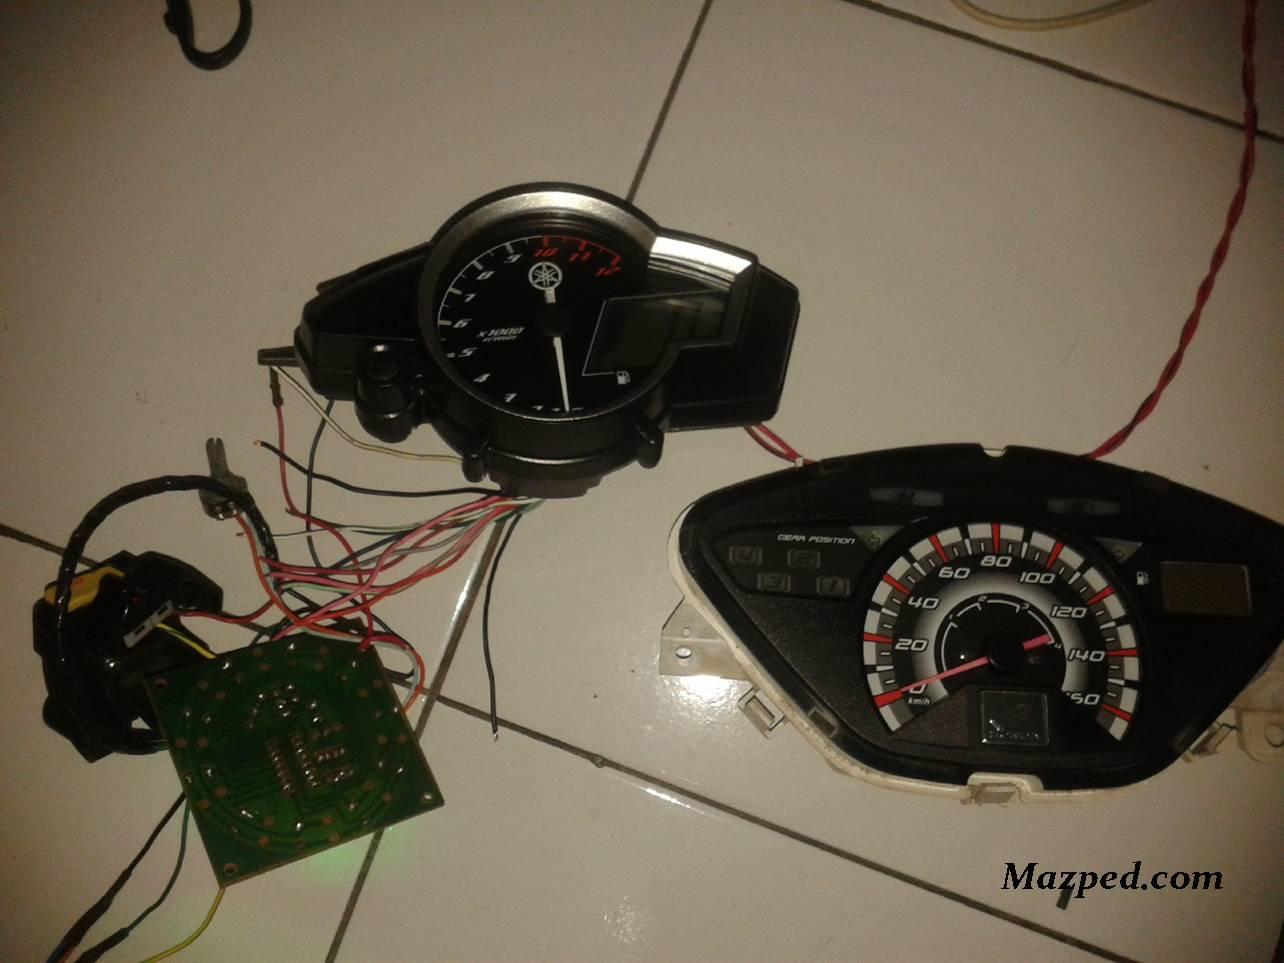 Wiring Diagram Wiring Diagram Speedometer Honda Cb150r New Full Version Honda Cb150r Dcwiringsystems Sicilyultratour It